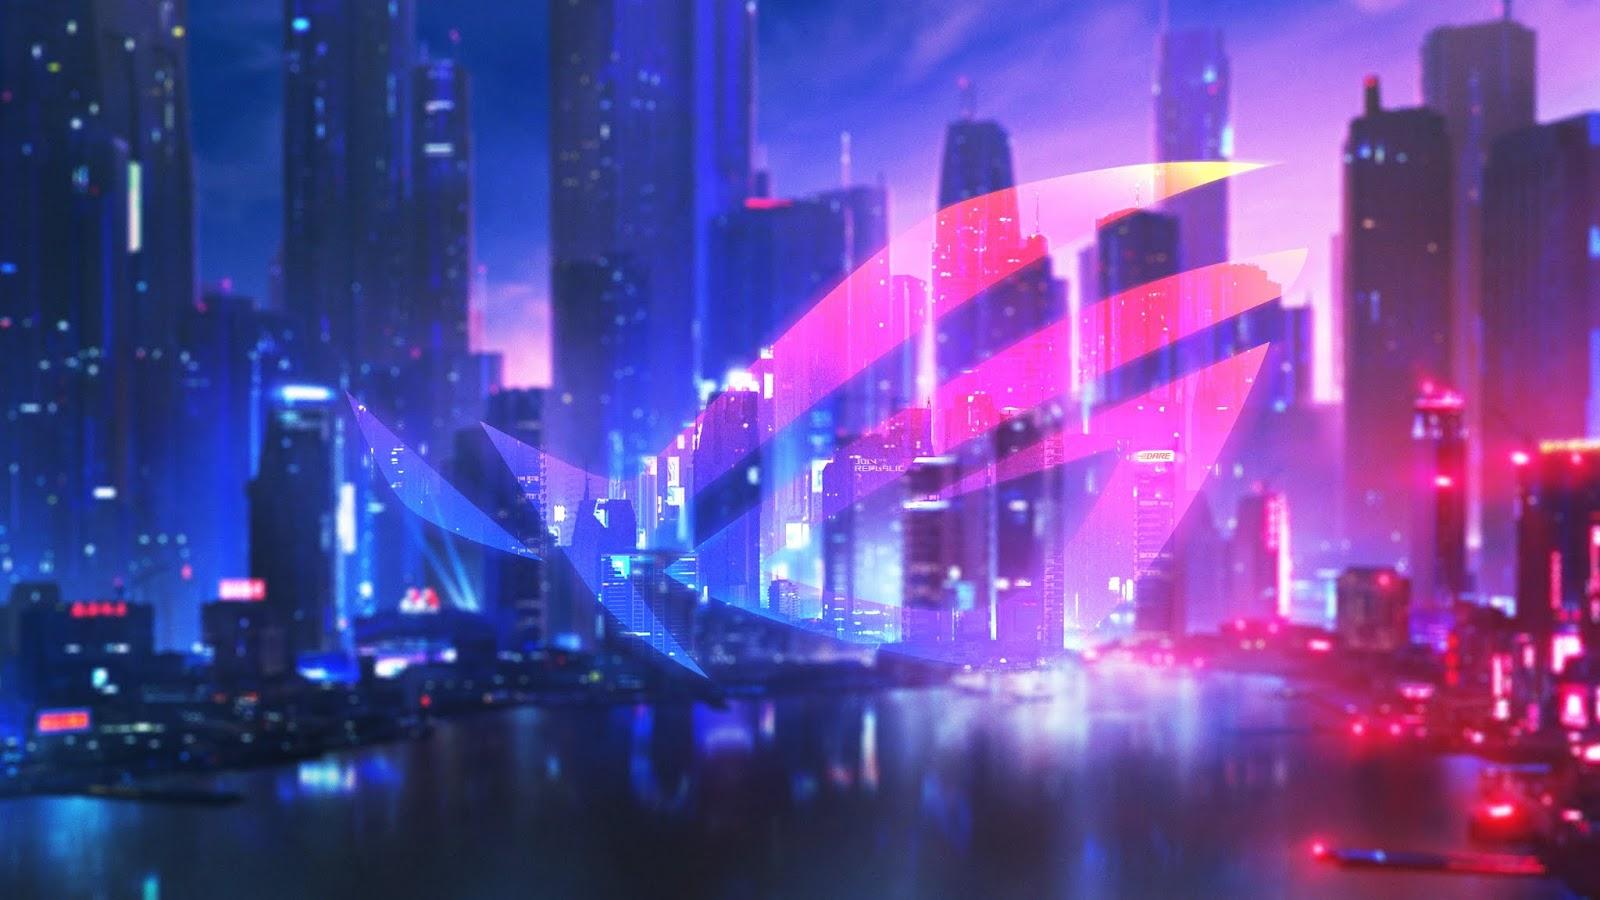 ASUS ROG, Neon, Nightfall, Skyscrapers, Urban, 4K, Technology